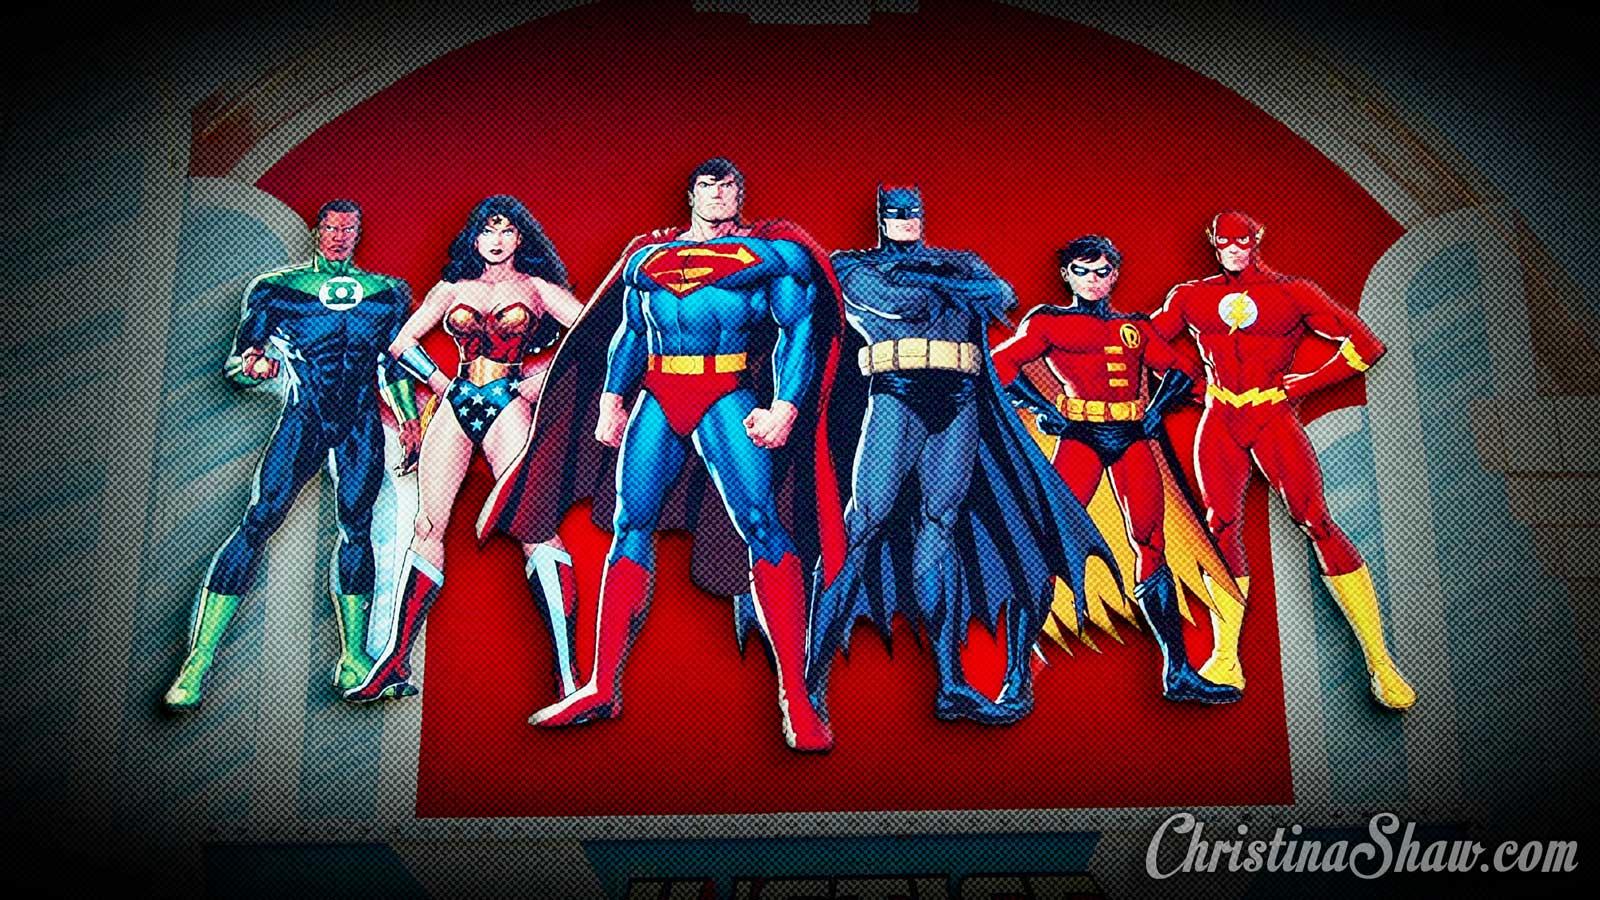 Free Justice League Desktop Wallpaper